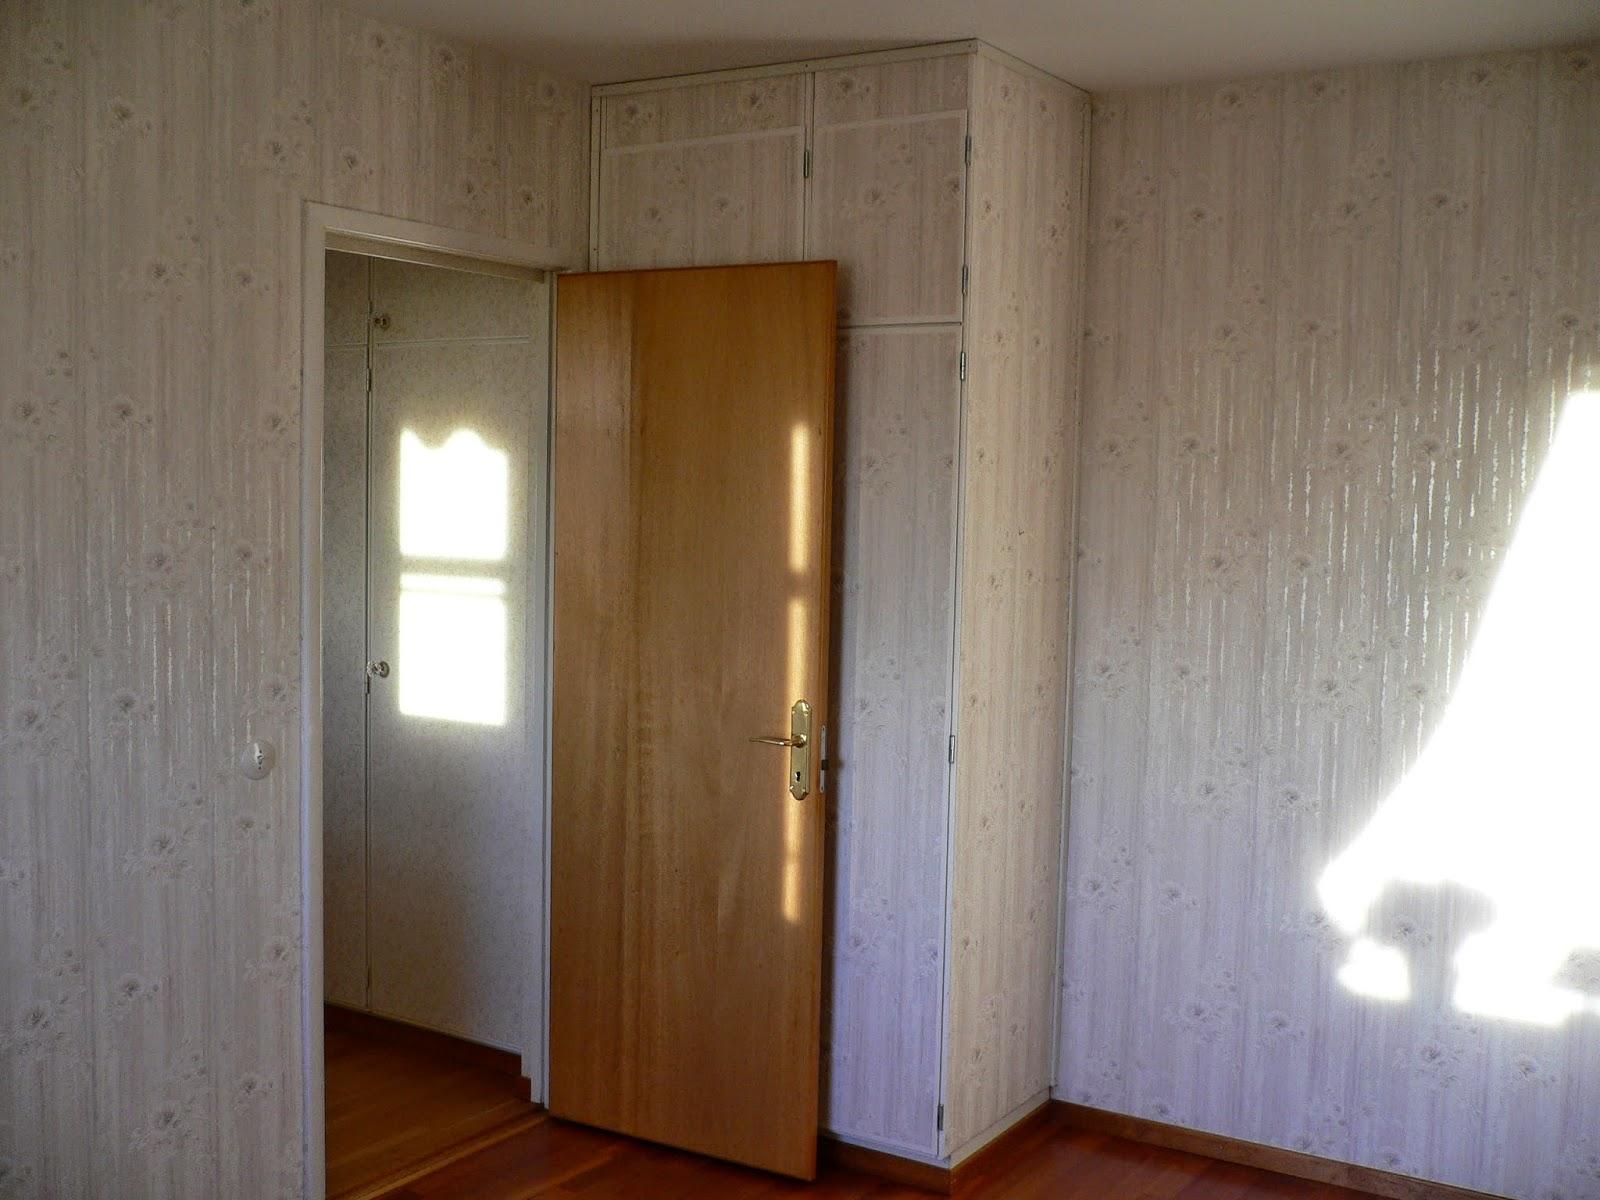 Med en doft av lavendel.: ett rum i förvandling.